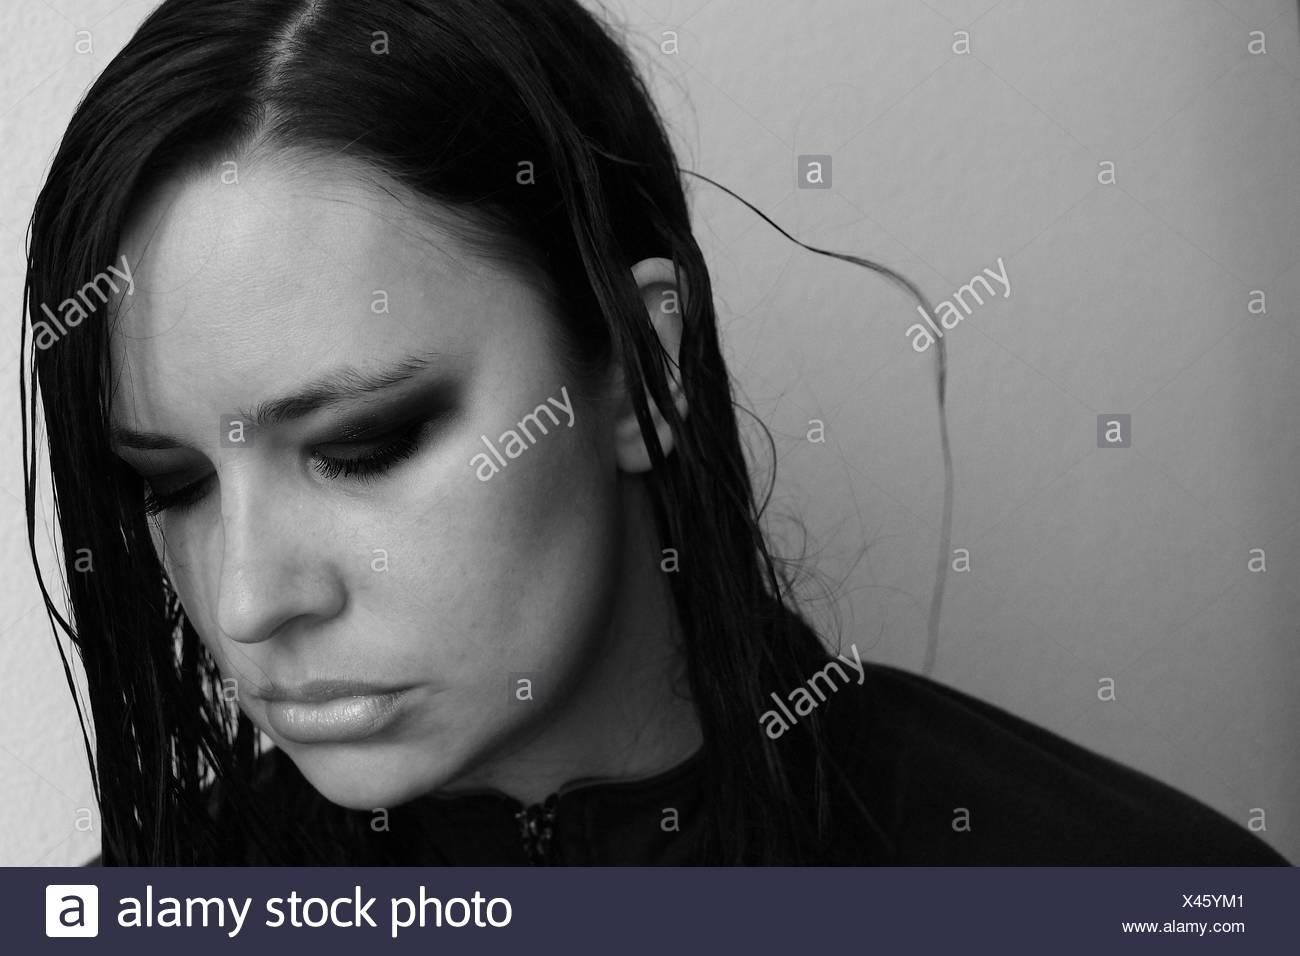 Woman Looking Away - Stock Image